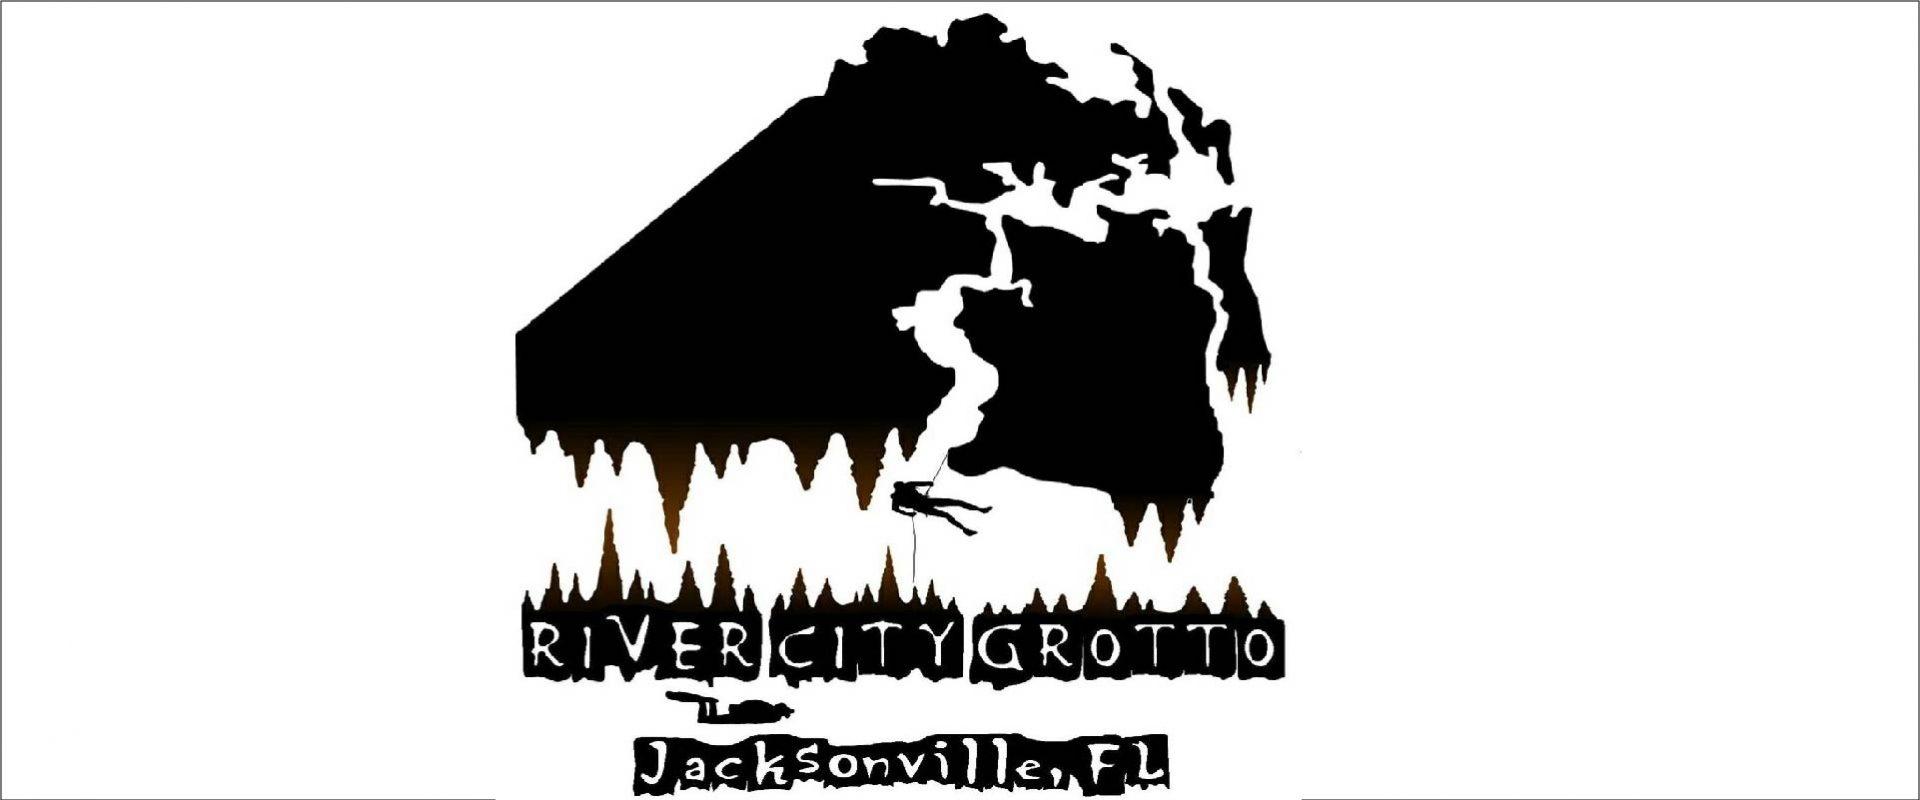 River City Grotto